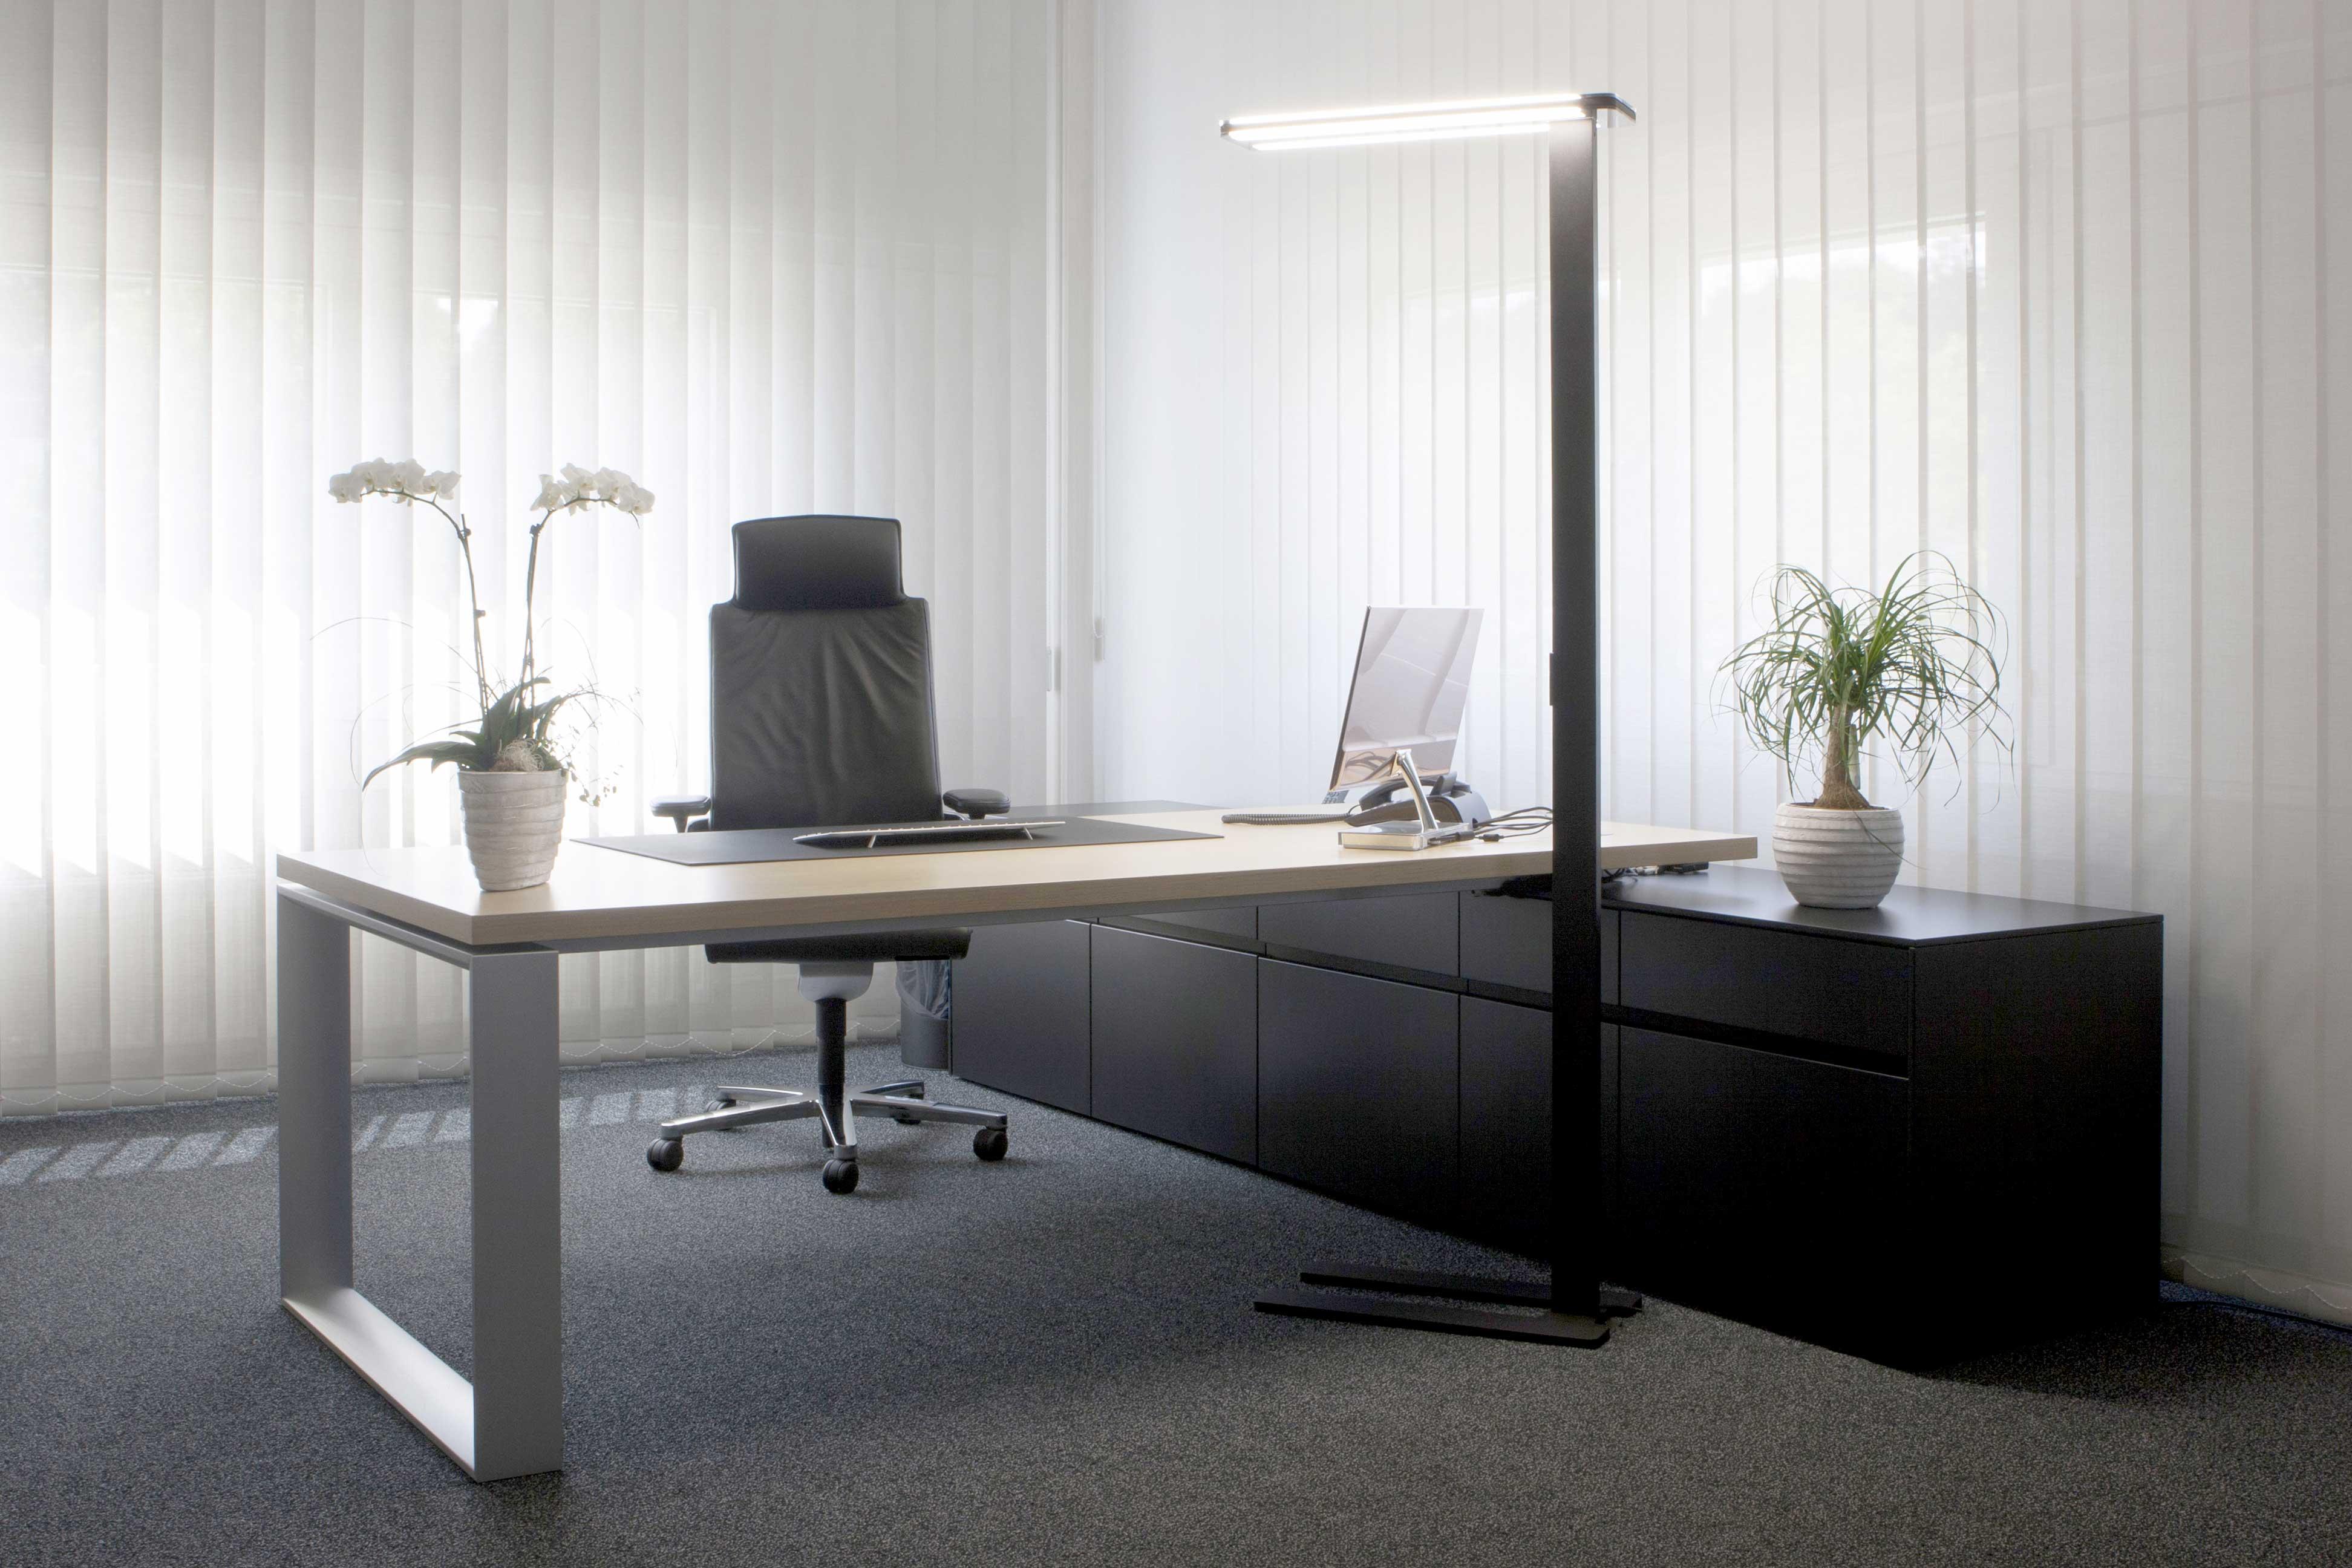 bdk luminaires lampadaire bureau administratif produits. Black Bedroom Furniture Sets. Home Design Ideas